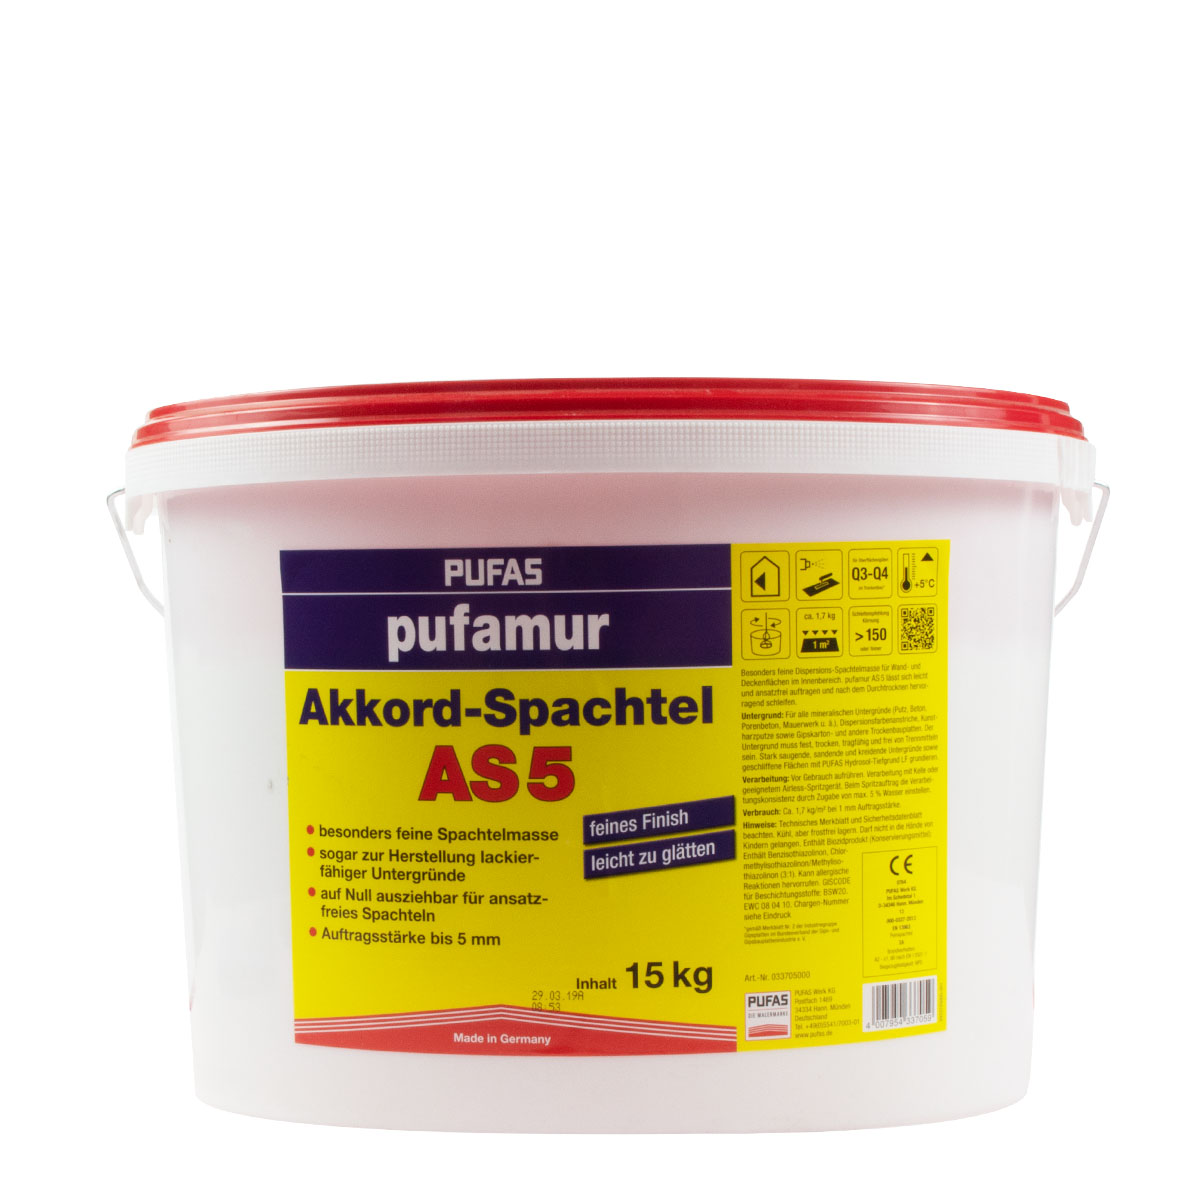 Pufas Pufamur Akkordspachtel AS5 15Kg gebrauchsfertiger Kunstharzspachtel